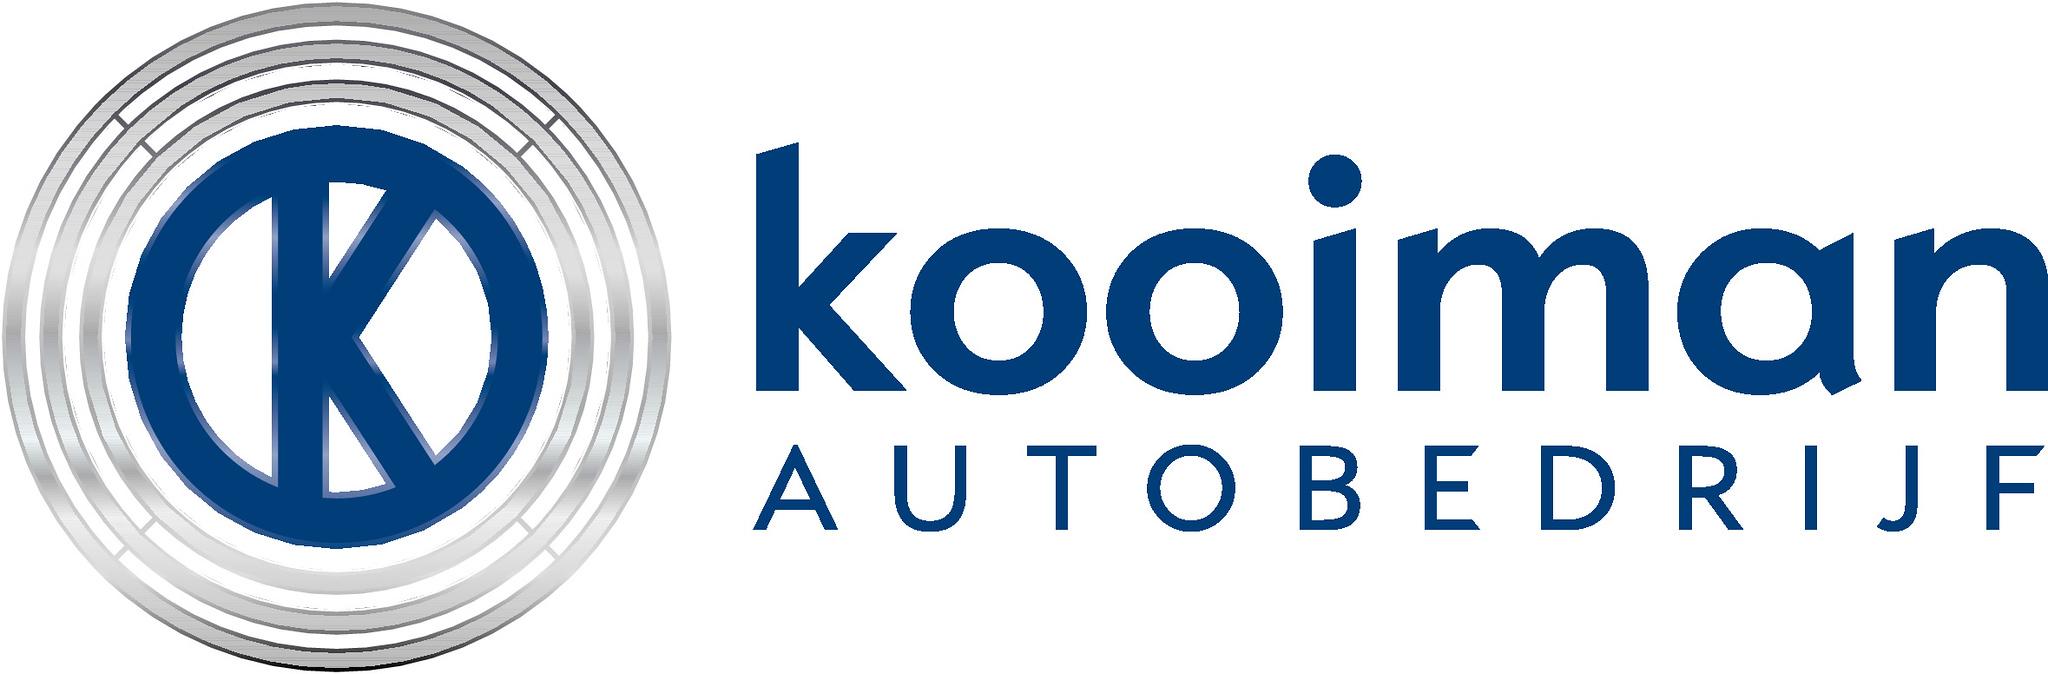 Opel Autobedrijf Kooiman